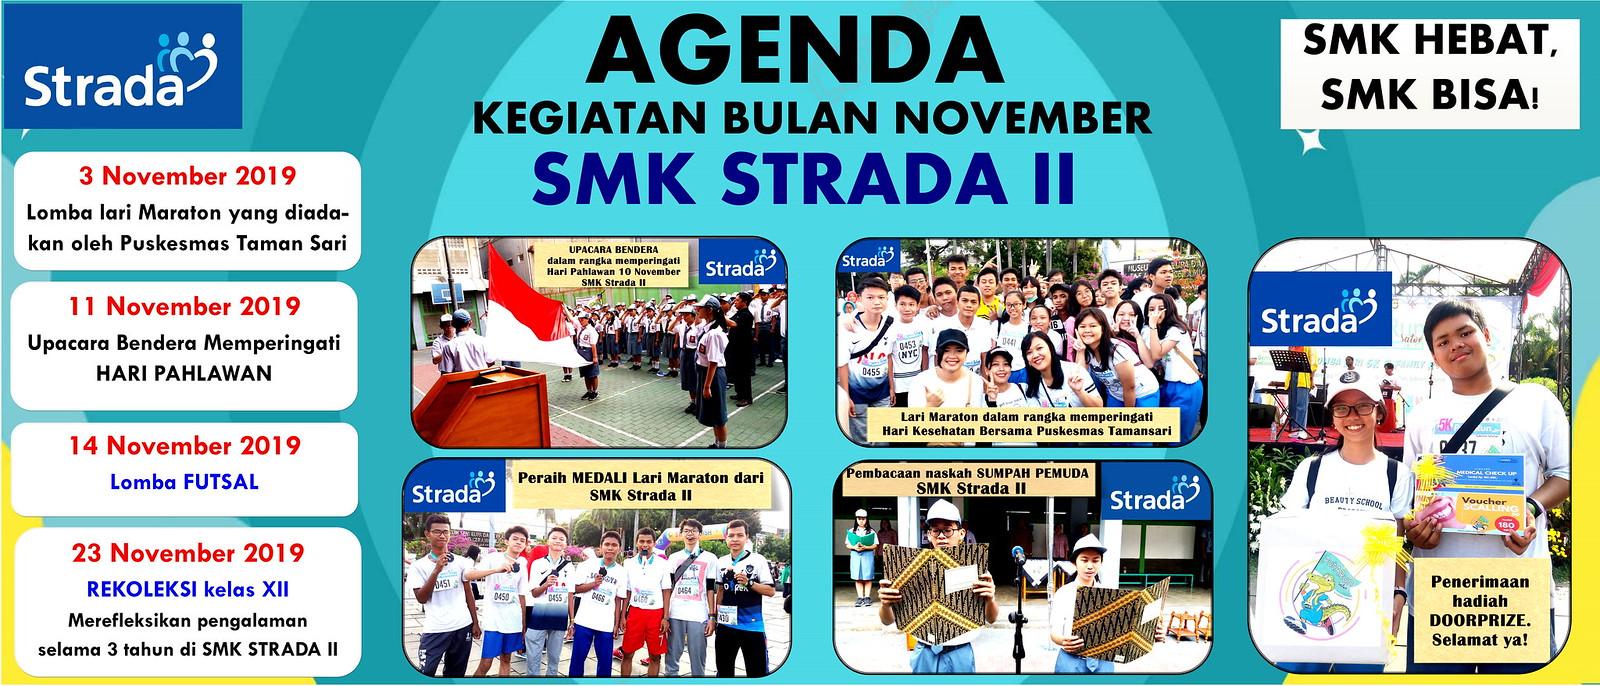 Agenda Kegiatan SMK Strada II Bulan November 2019